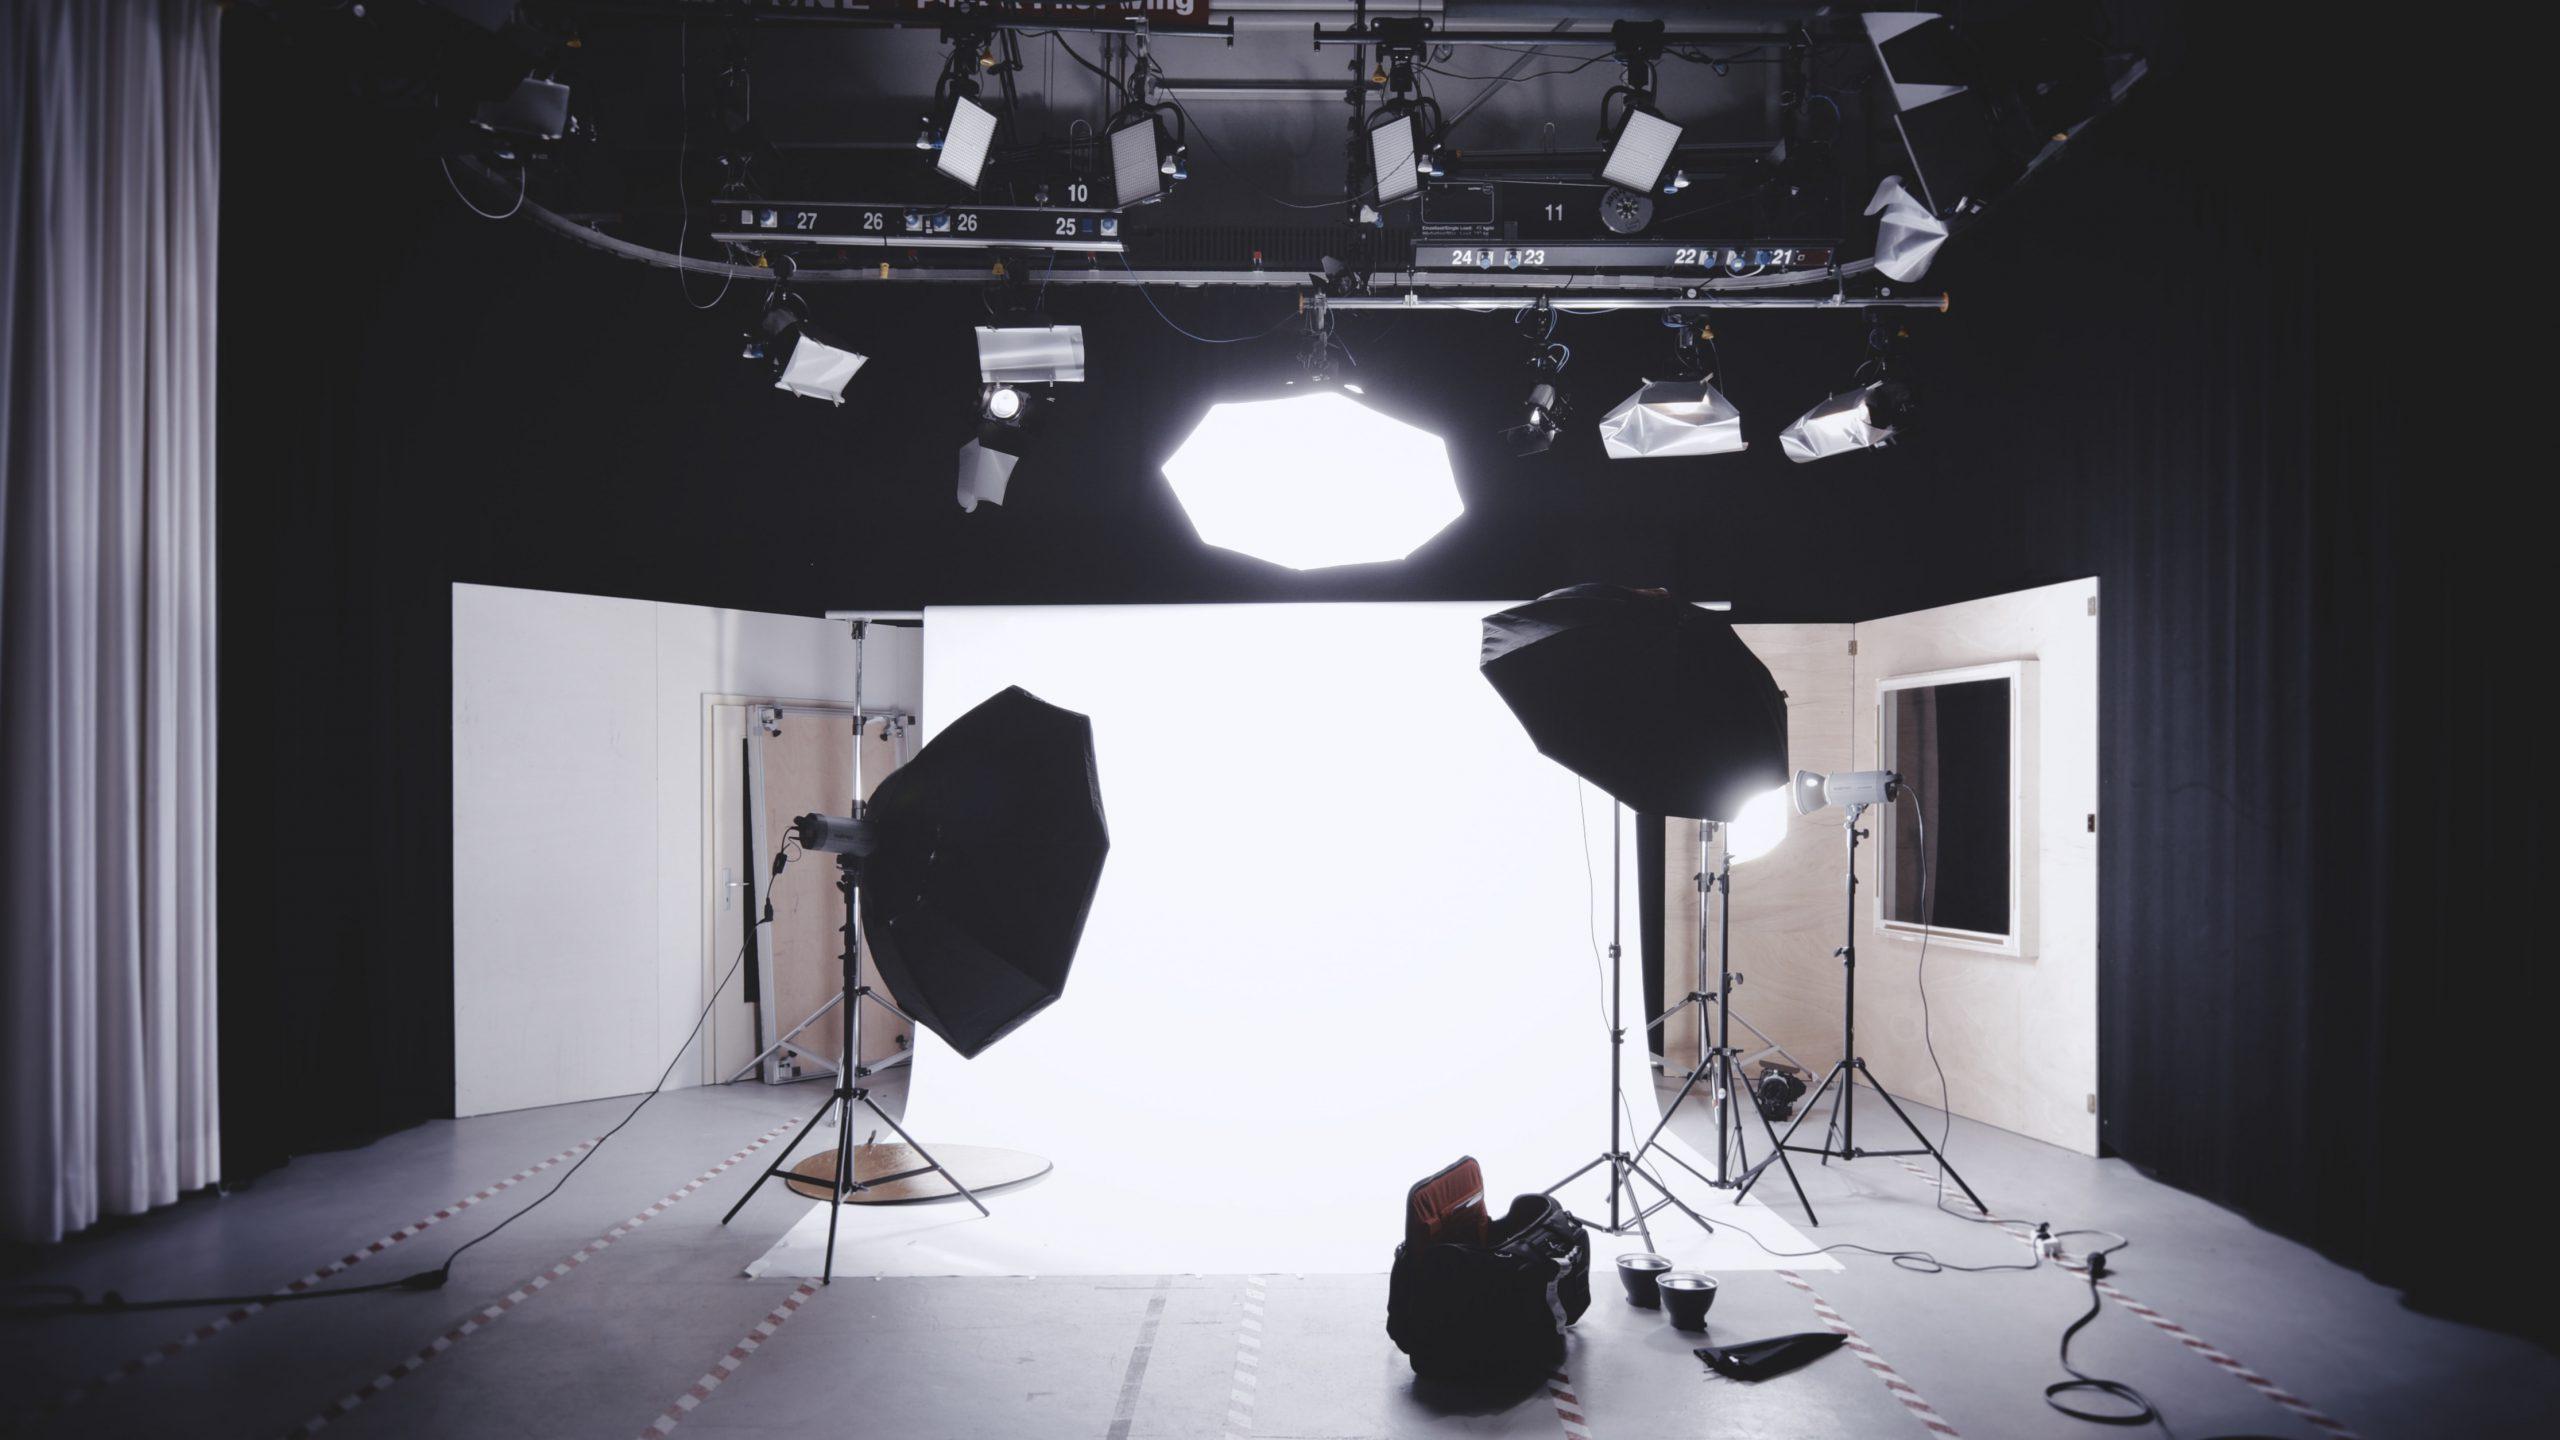 5 tips para ser un buen conductor de tv o de tus videos de redes